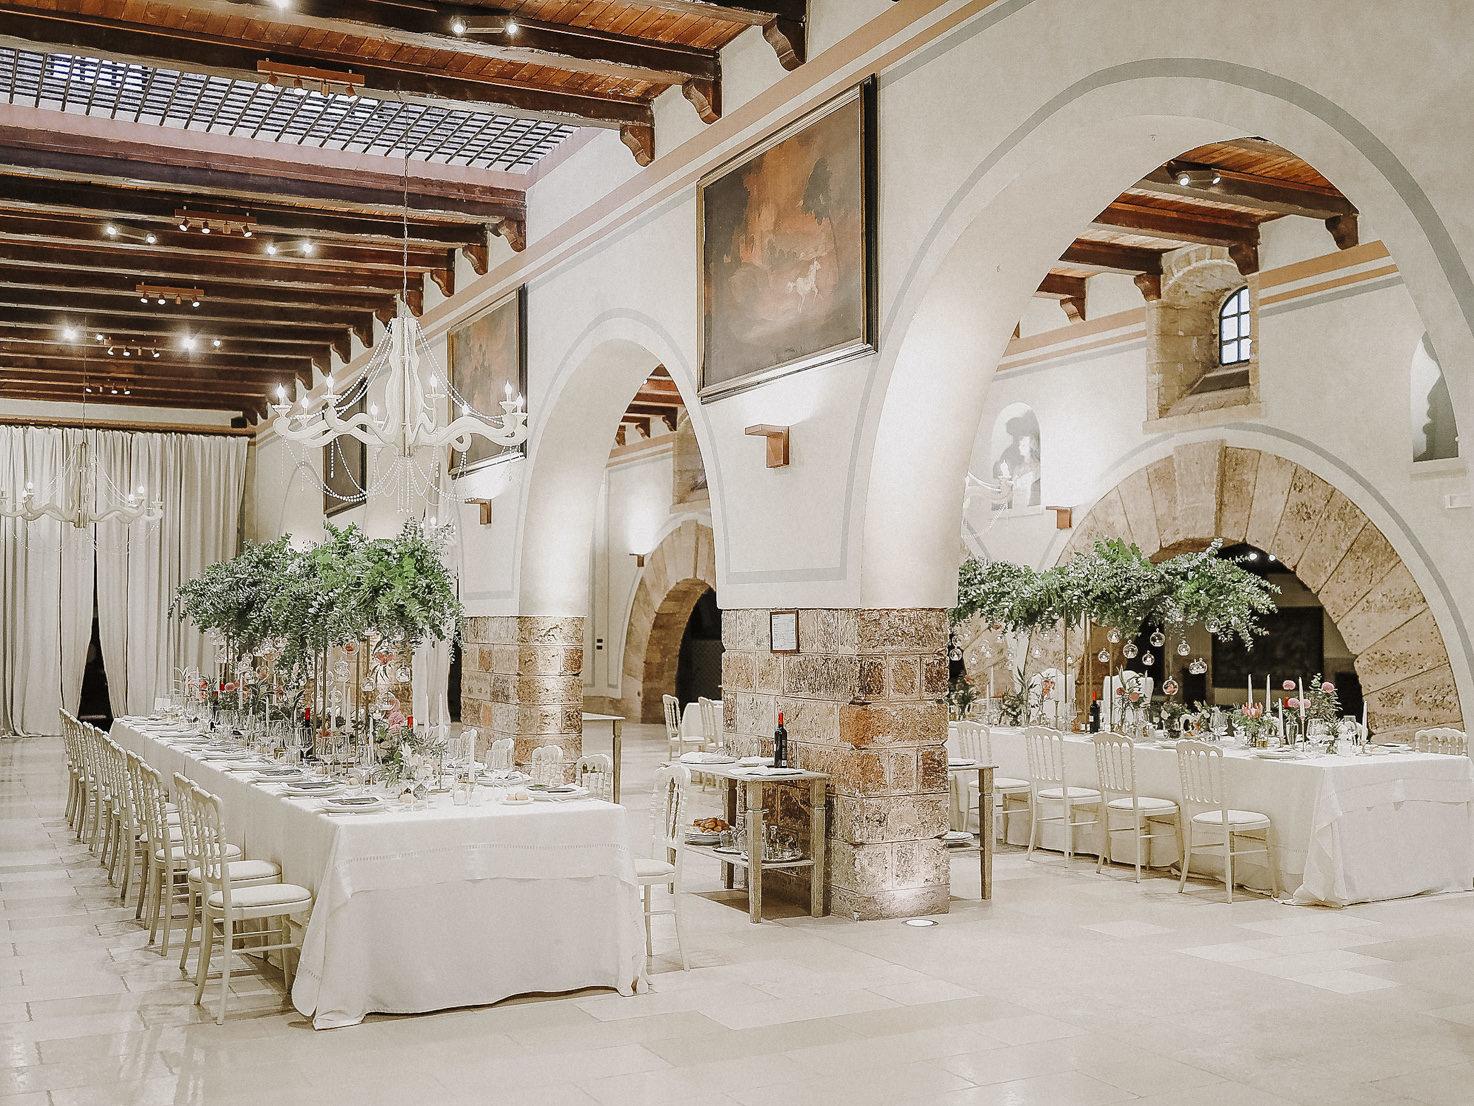 Wedding banquet at Castello Monaci